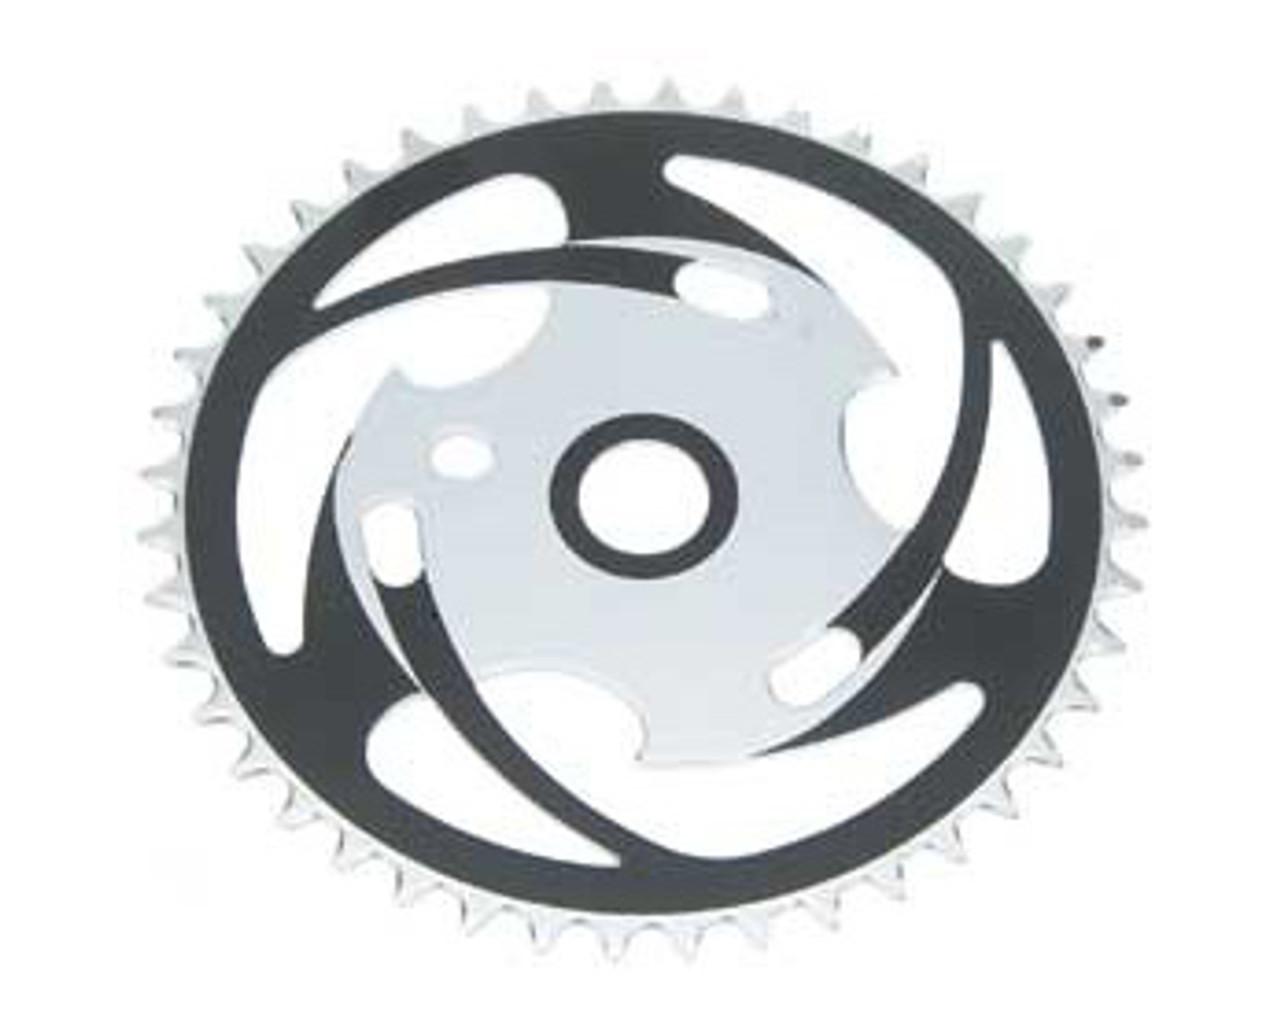 JS Chainring One Piece Crank 1 Piece Chain Wheel 44T Black//Chrome